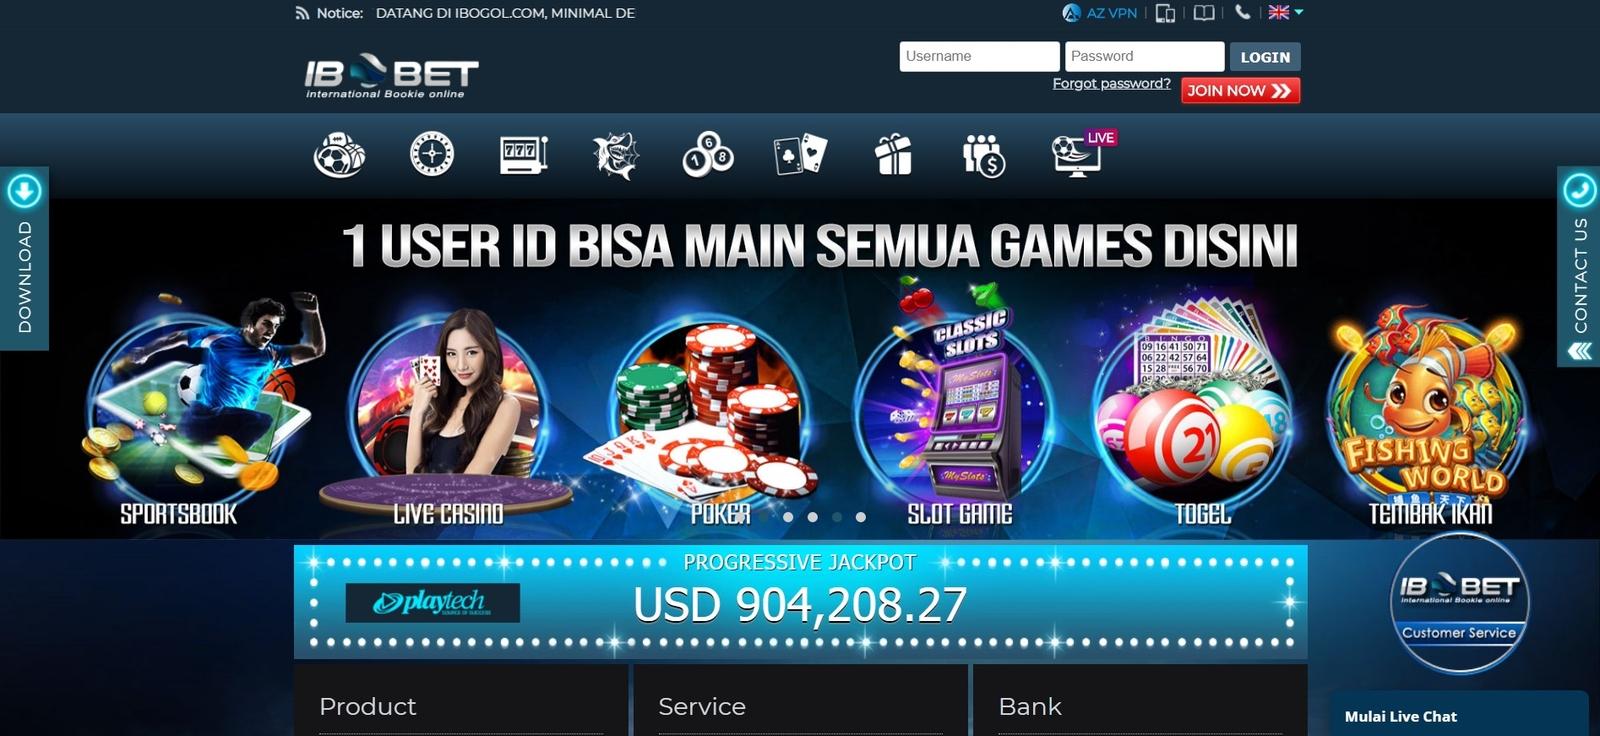 Situs Judi Qq Slot Online T Dribbble